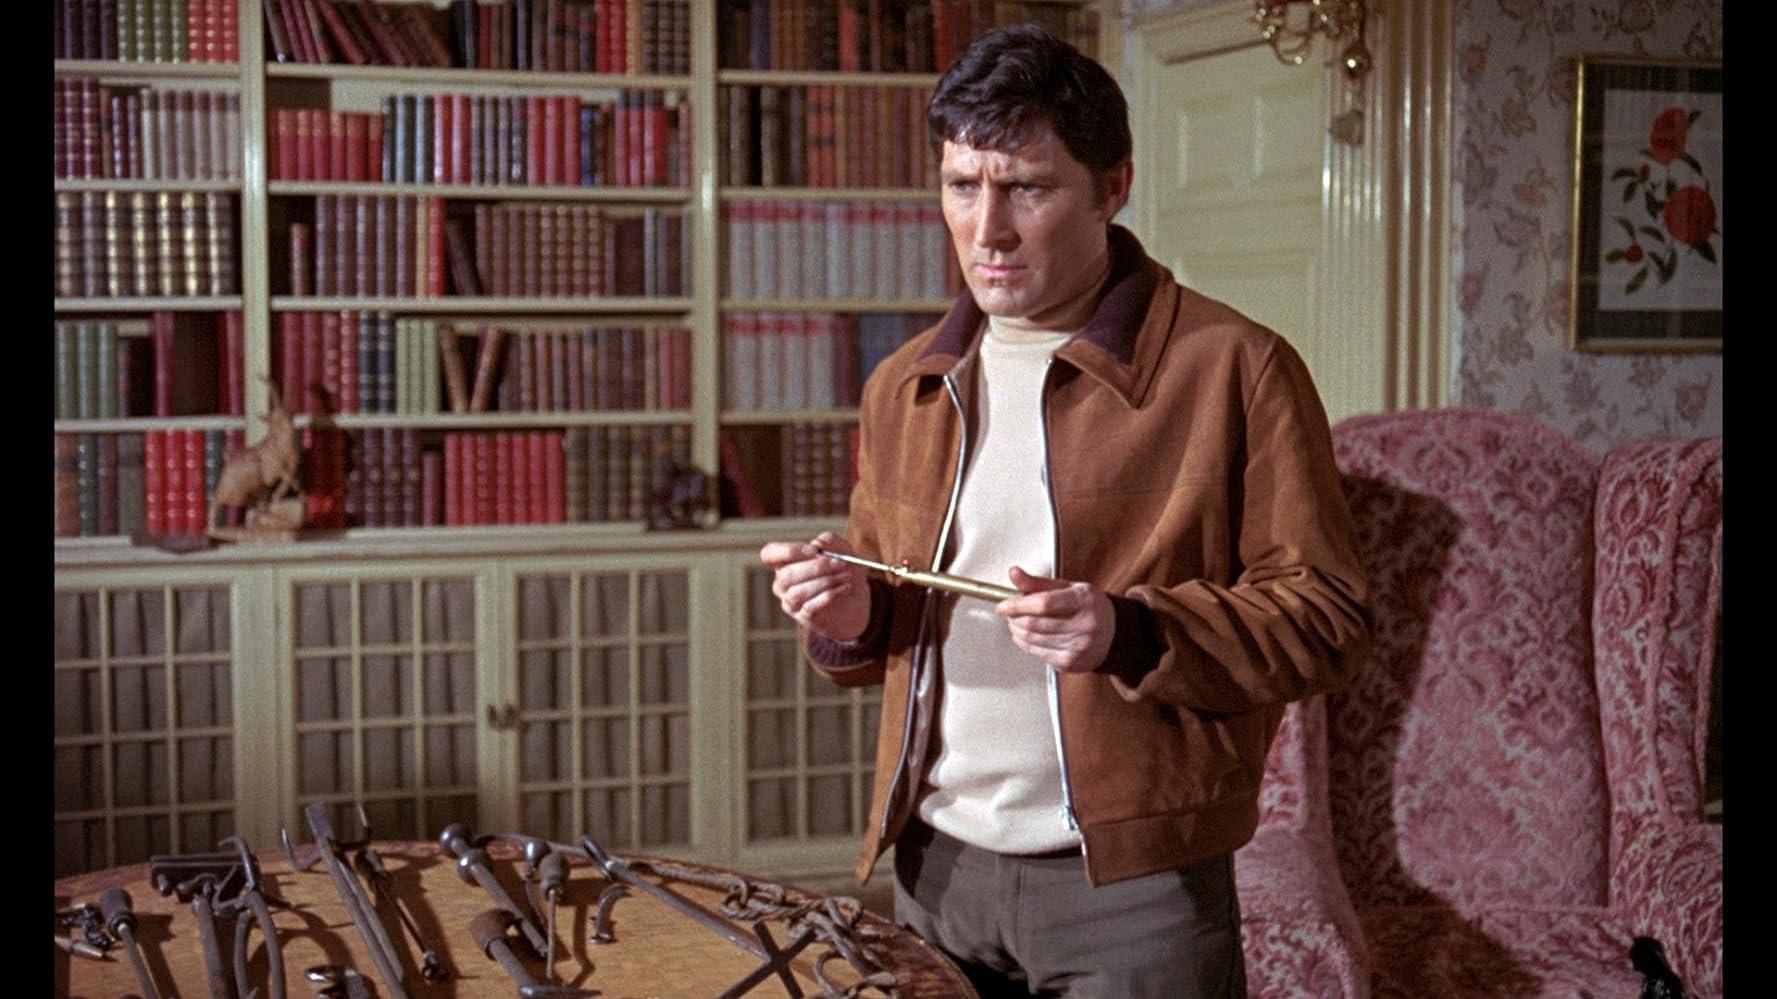 Mark Eden in Curse of the Crimson Altar (1968)